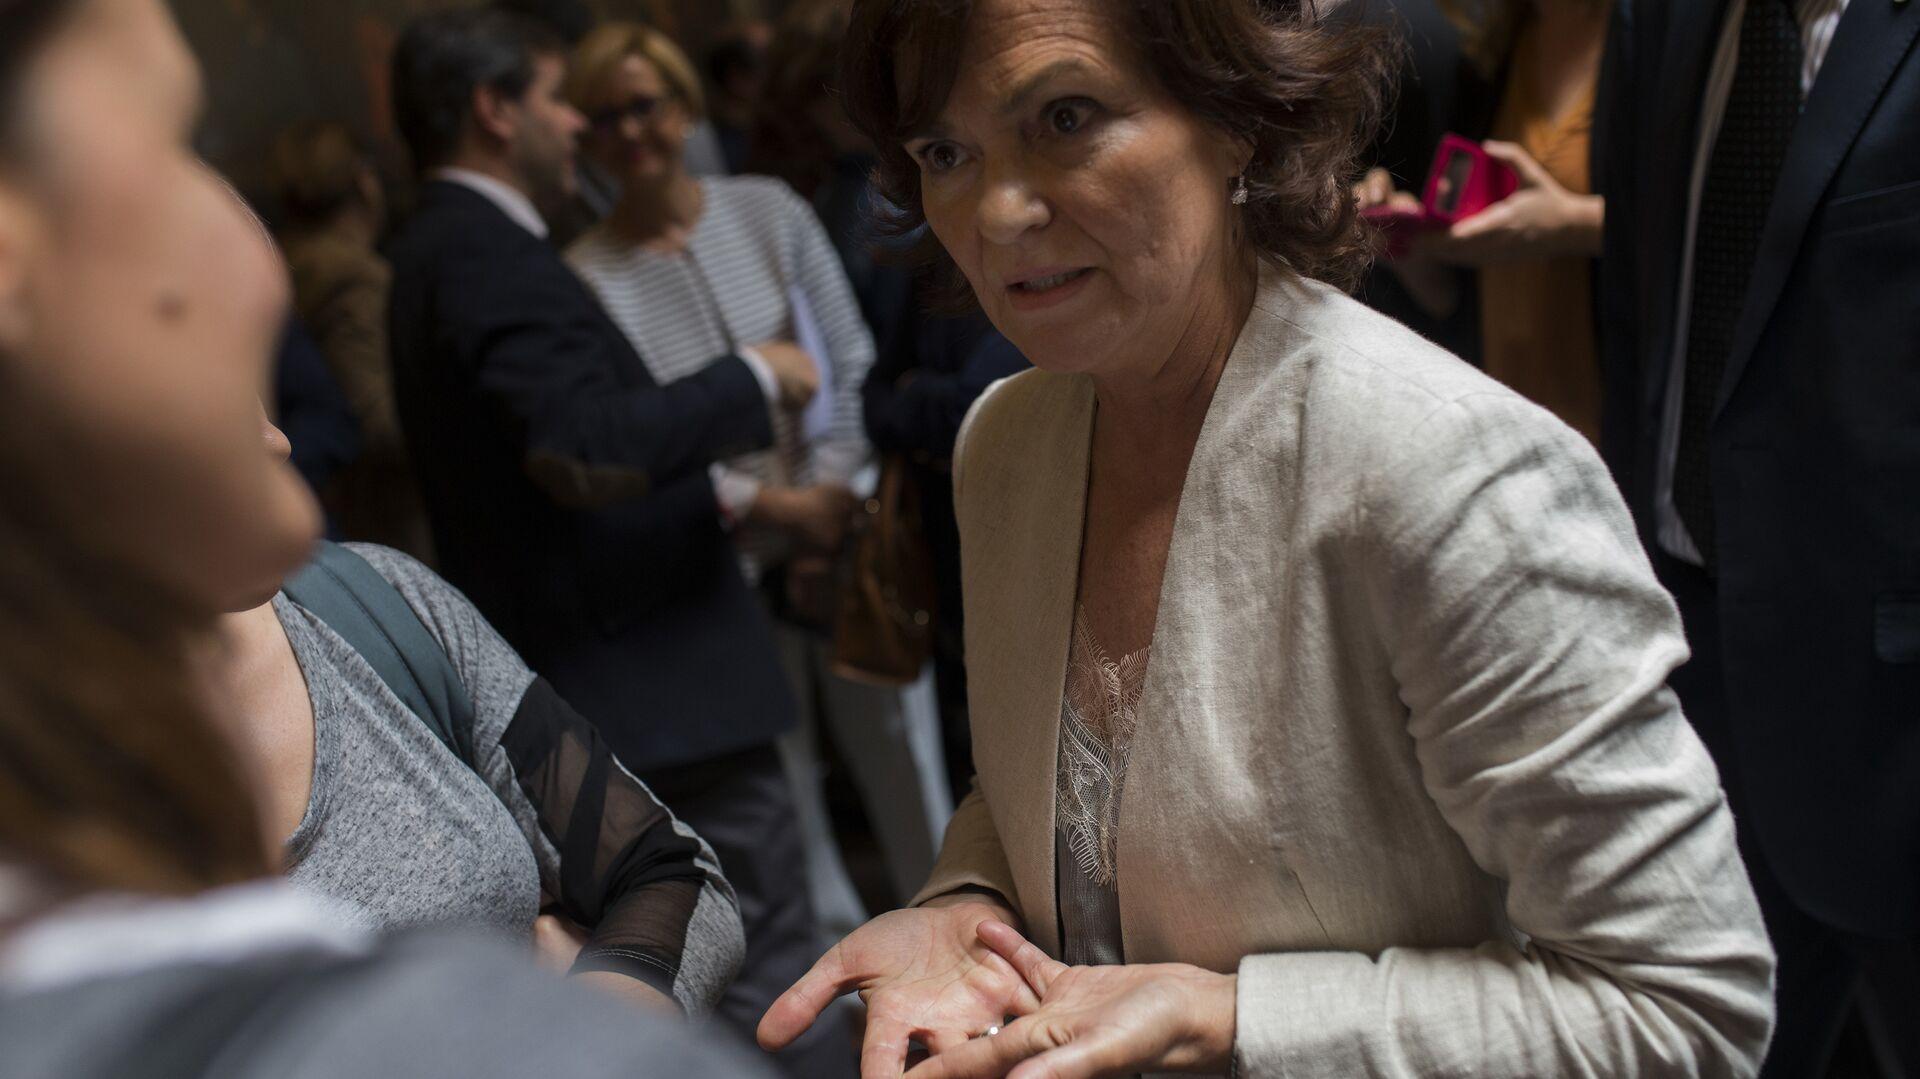 Carmen Calvo, vicepresidenta del Gobierno español - Sputnik Mundo, 1920, 16.04.2021